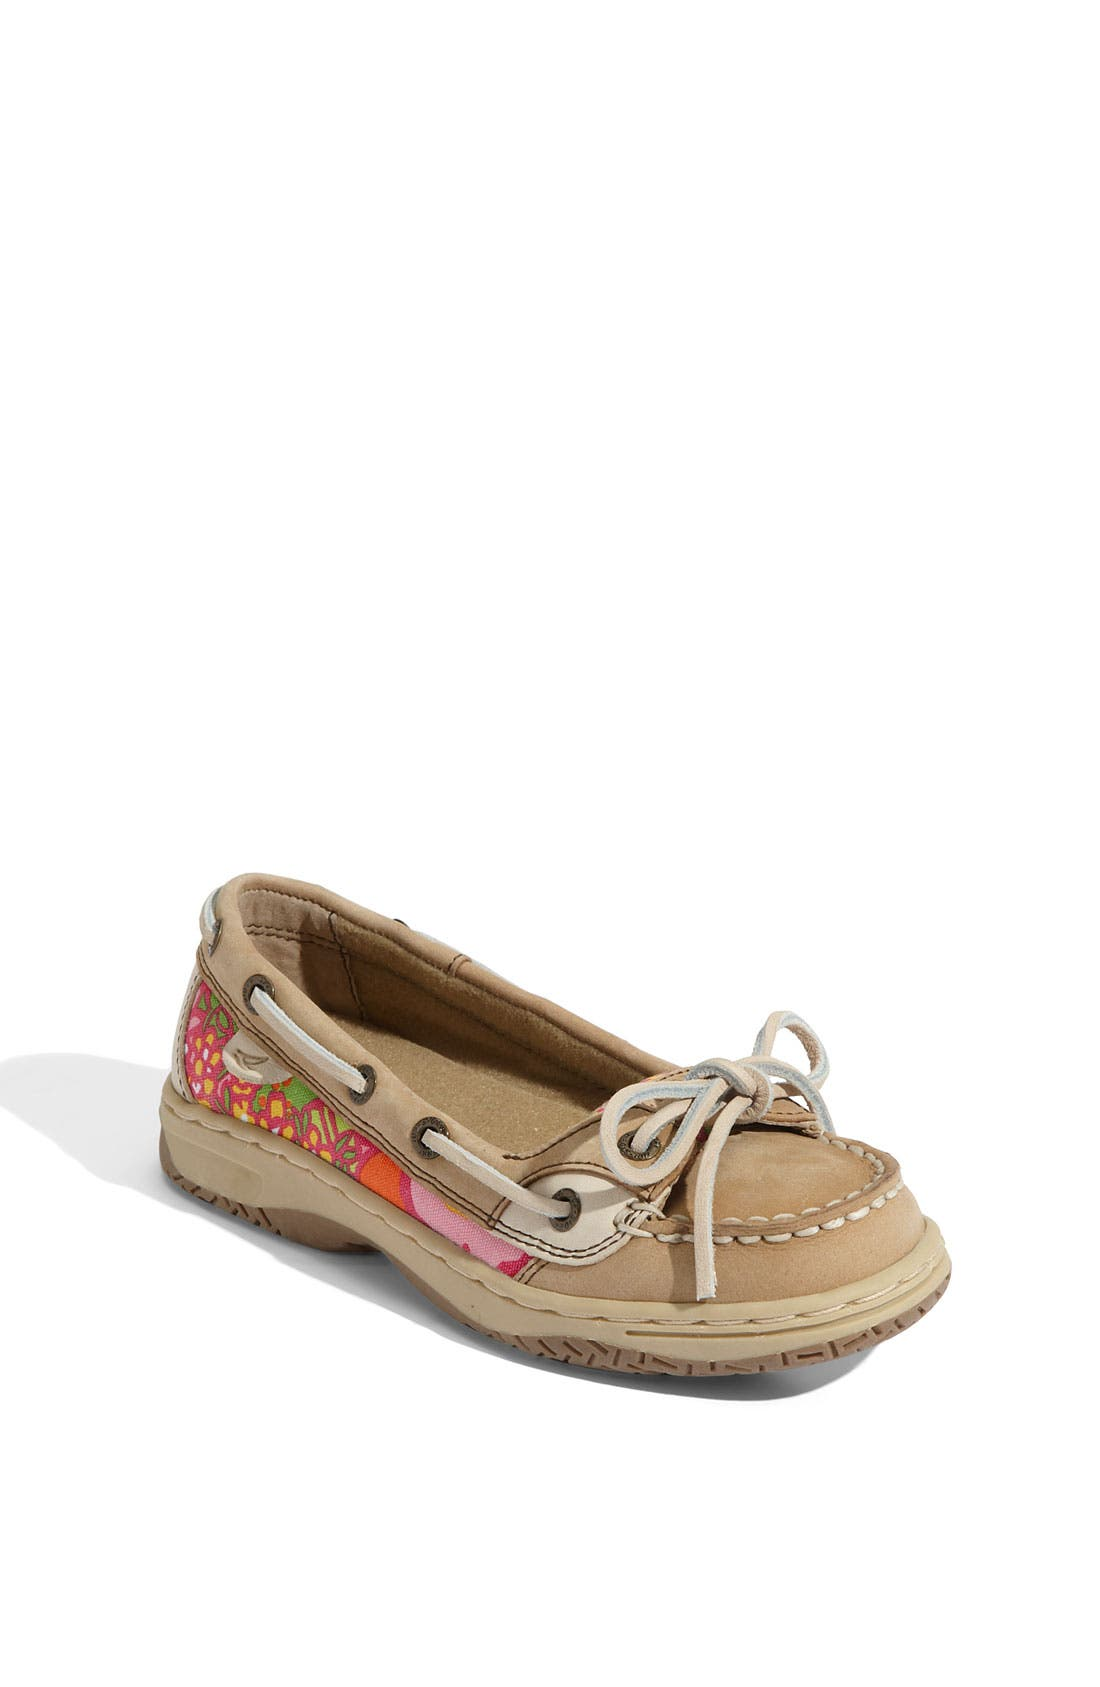 Main Image - Sperry Kids 'Angelfish' Boat Shoe (Little Kid & Big Kid)